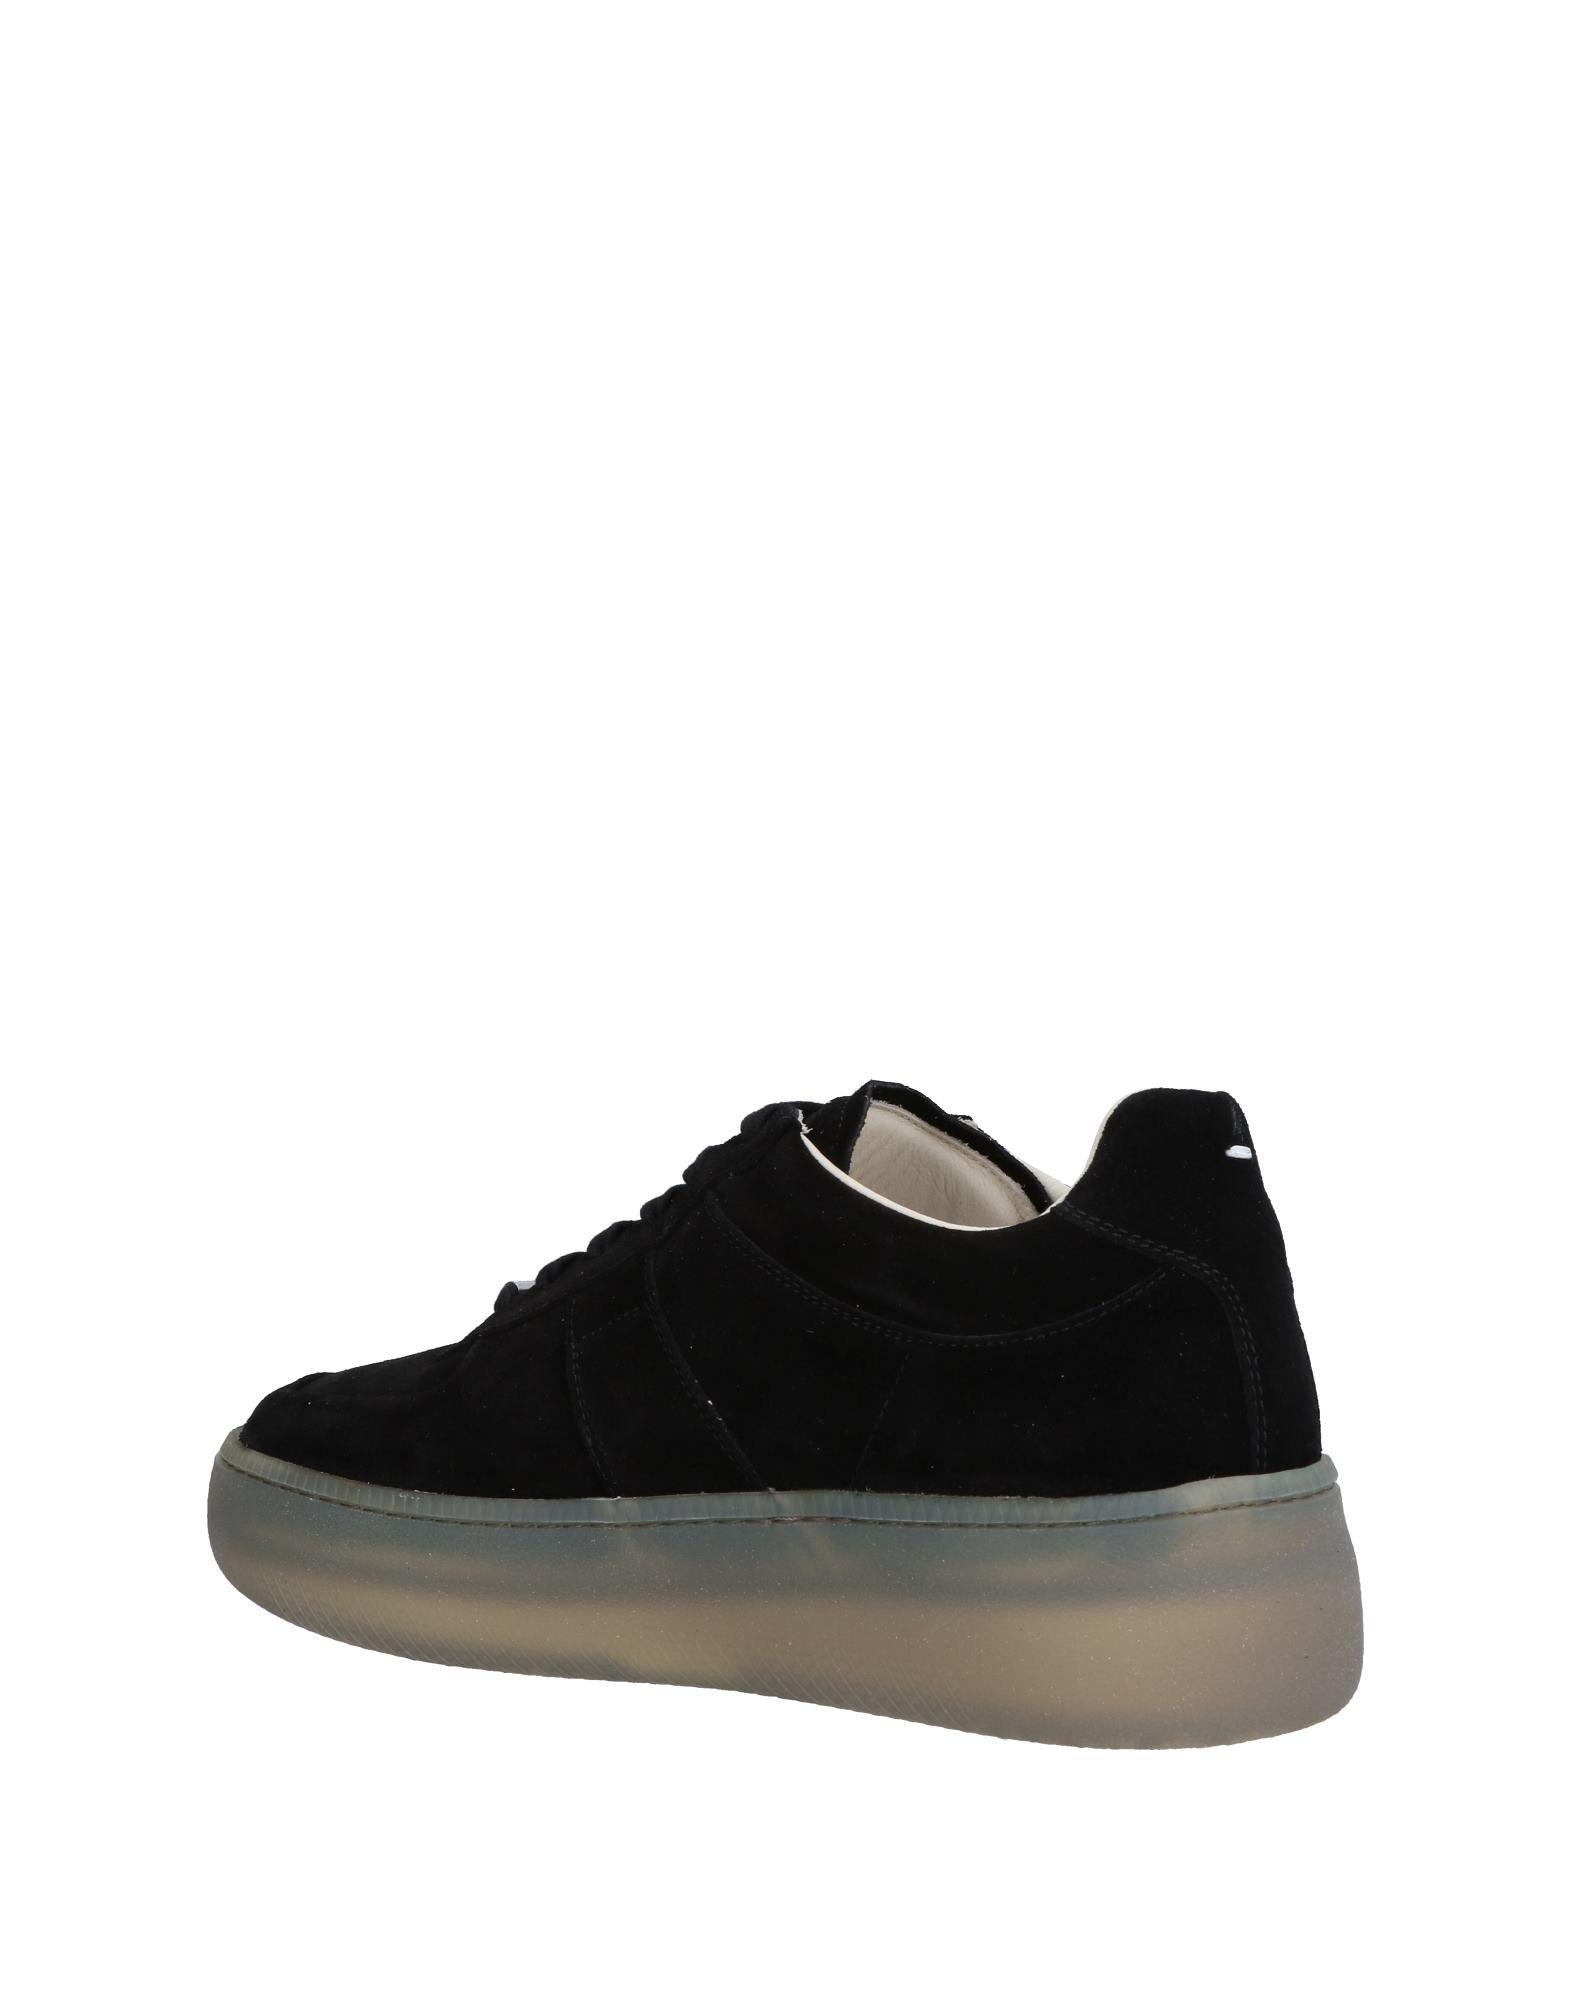 Maison Margiela Sneakers Herren  11471873VD Gute Qualität beliebte Schuhe